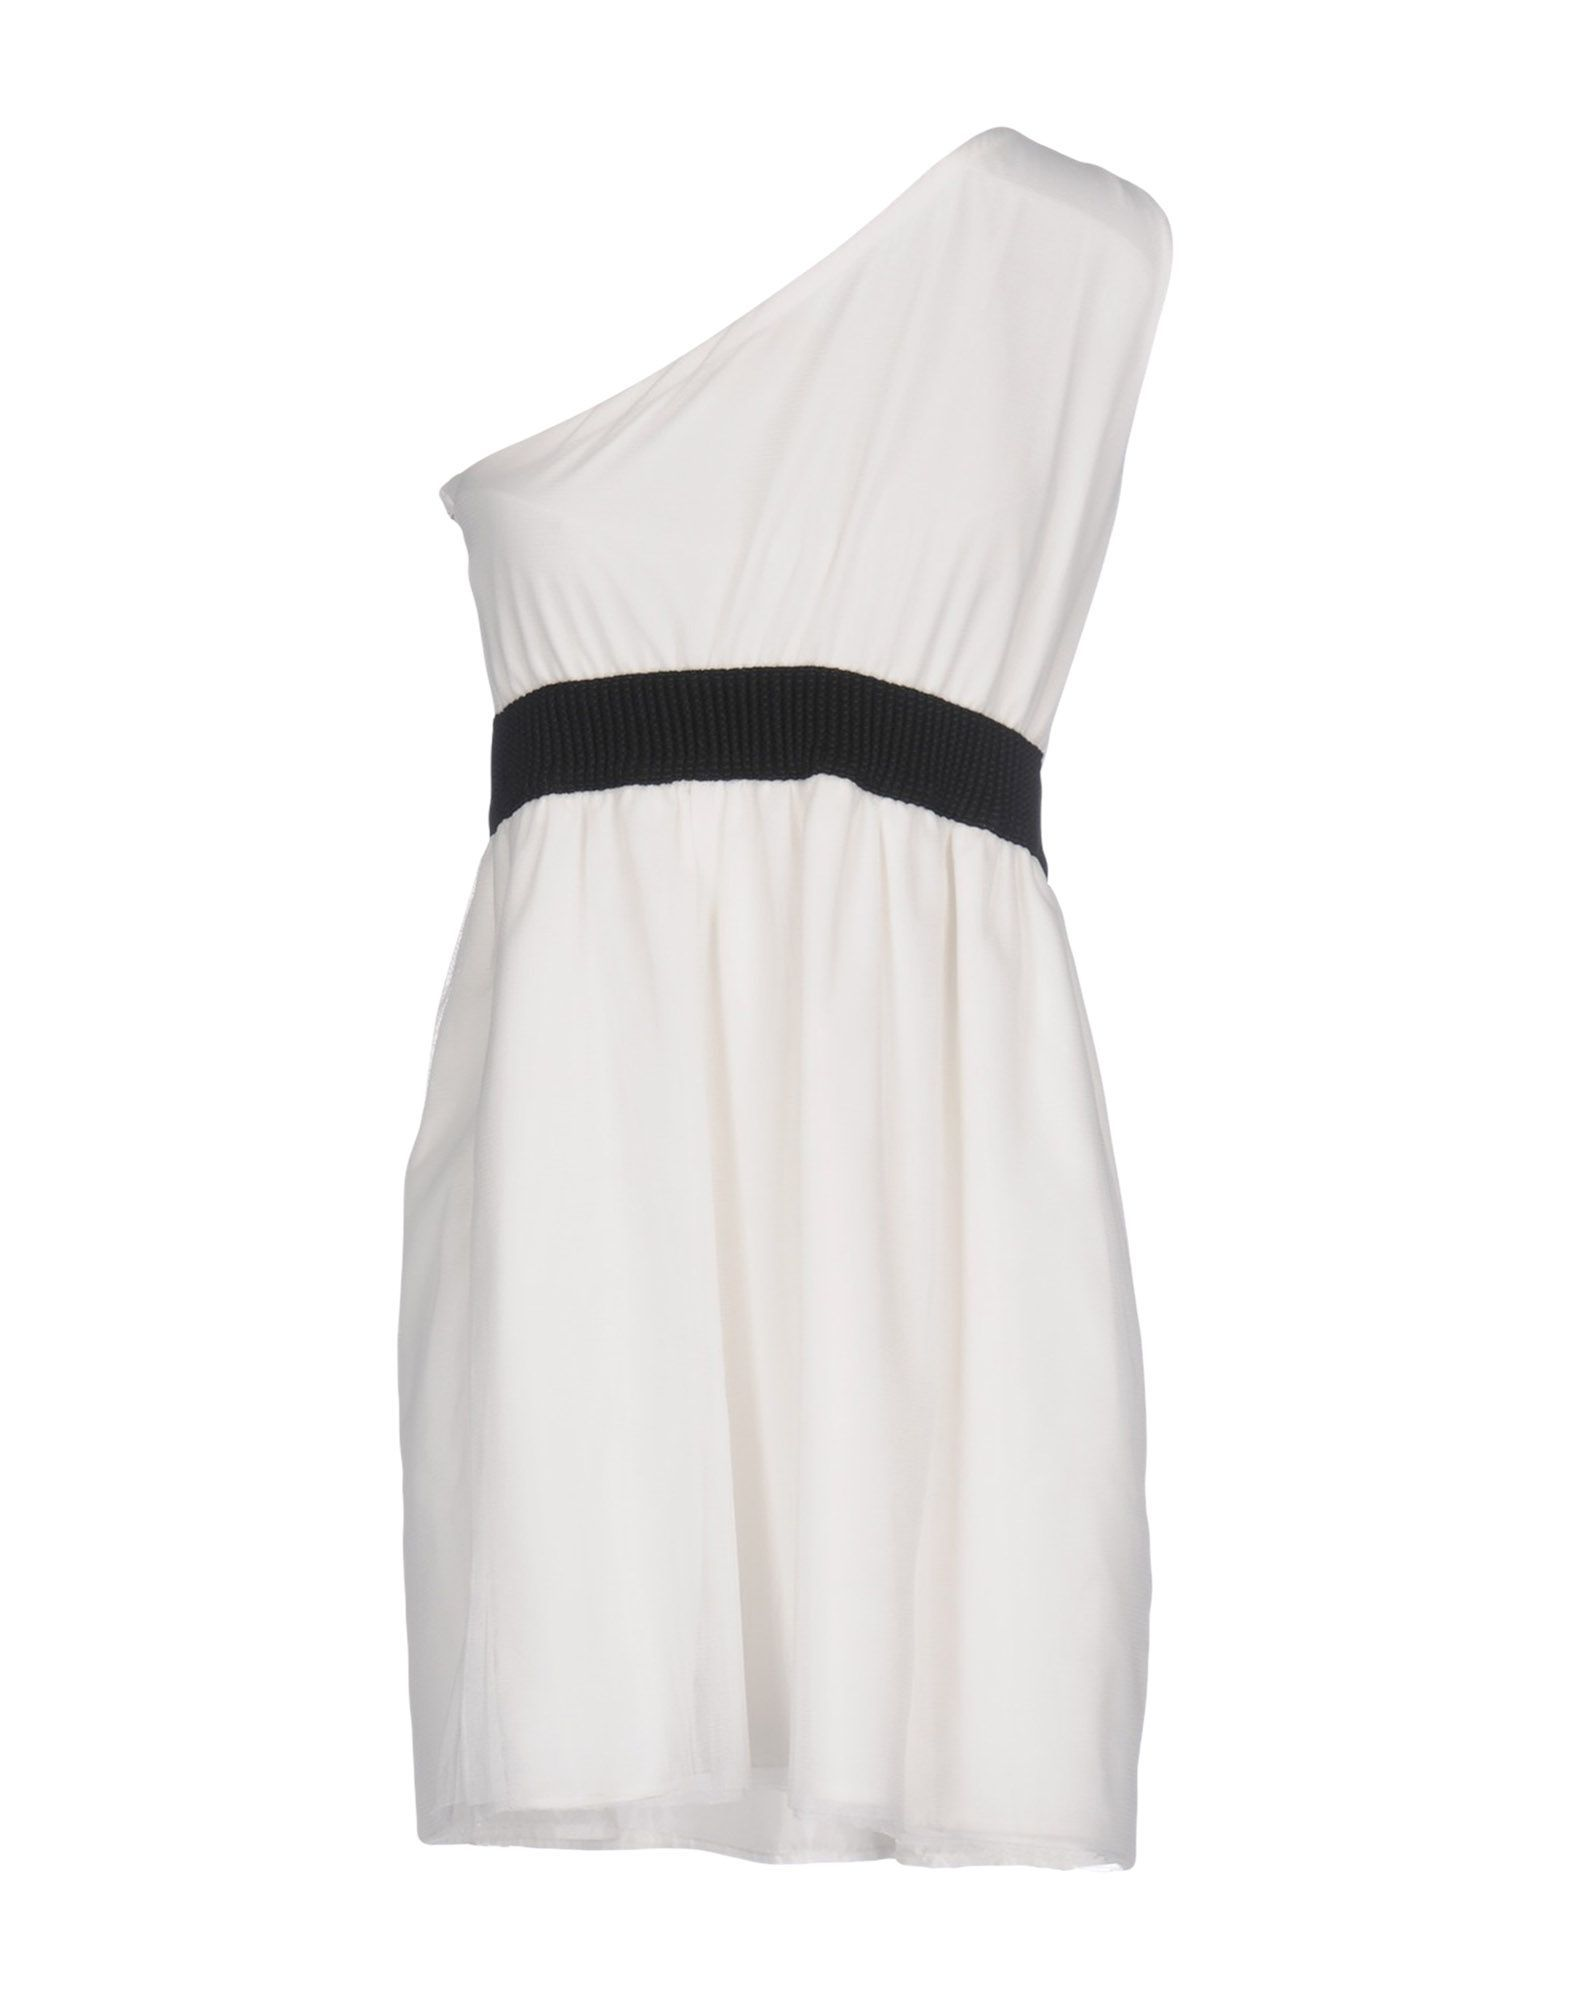 Dress Mary D'aloia� White Women's Nylon